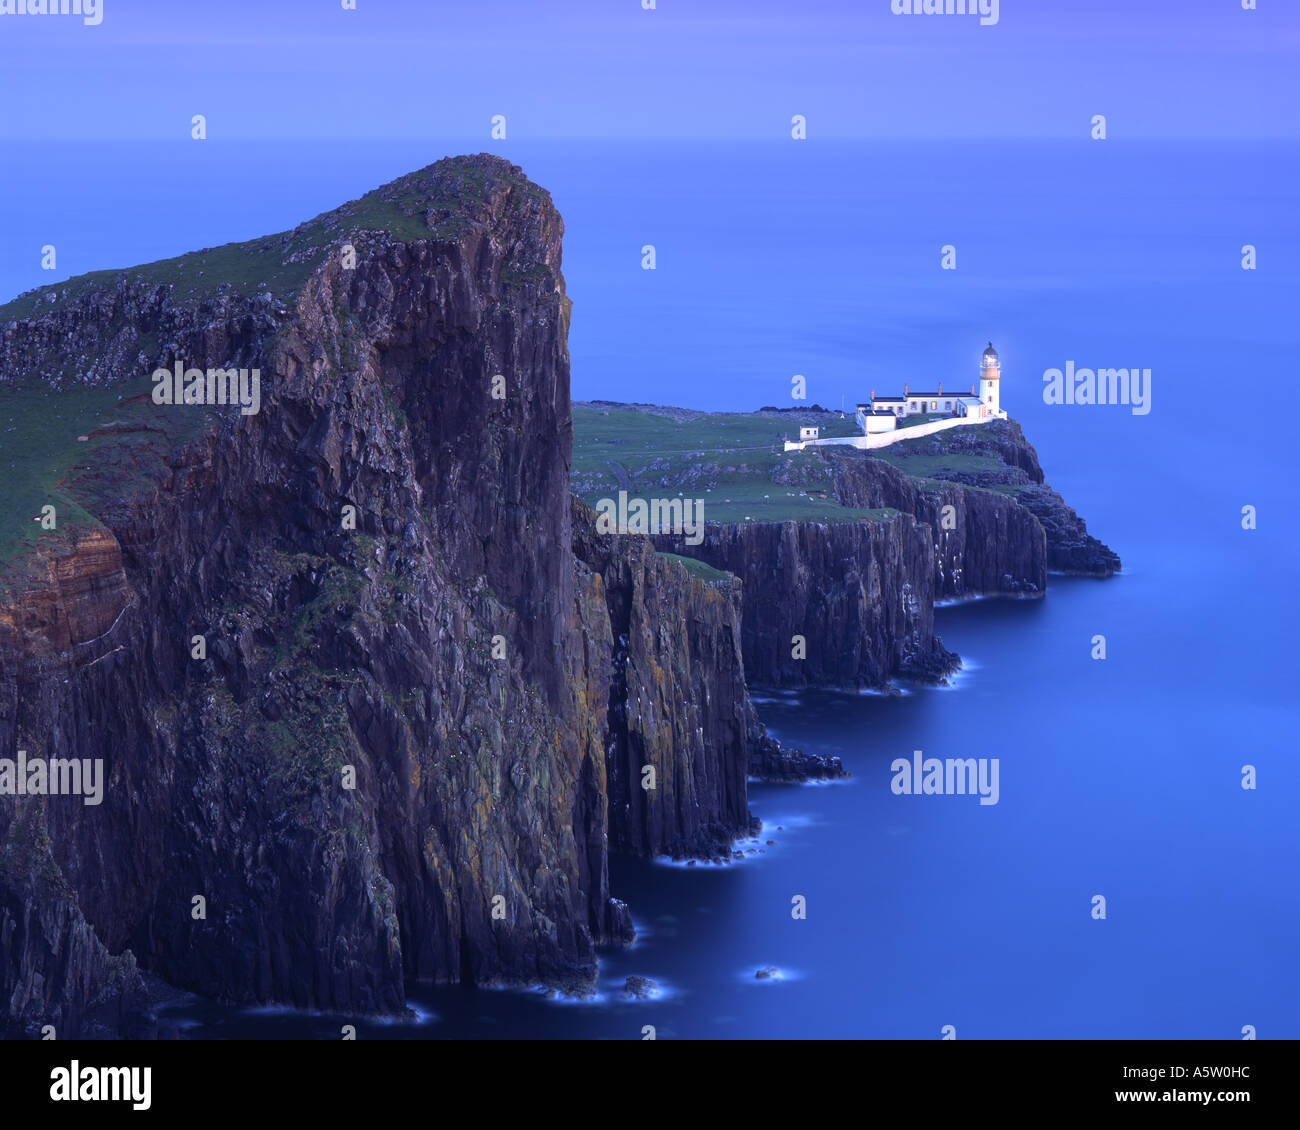 GB - SCOTLAND: Neist Point Lighthouse on the Isle of Skye Stock Photo